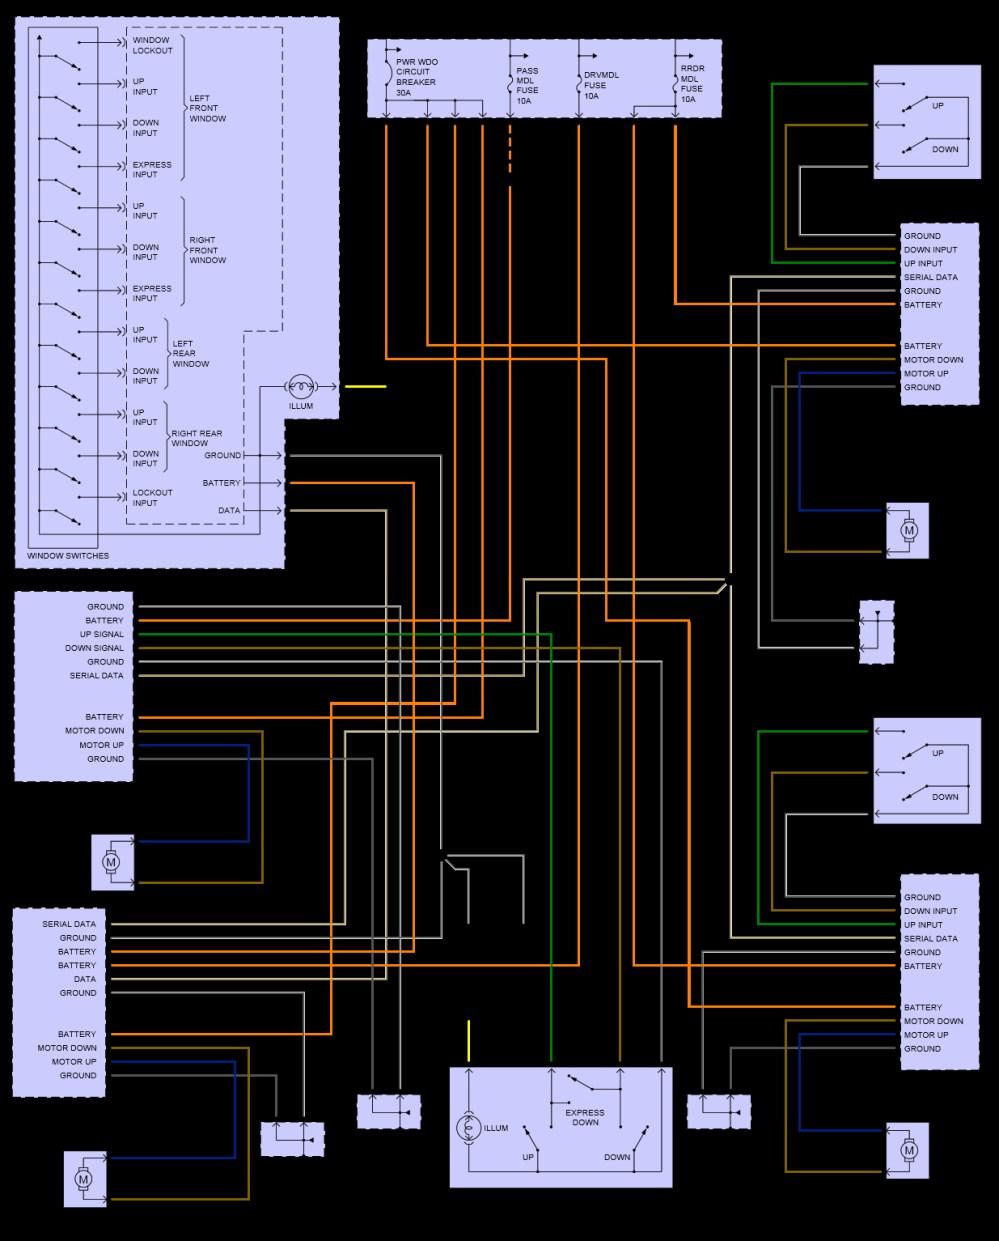 medium resolution of 2001 buick century stereo wiring diagram download wiring diagram rh faceitsalon com 1998 buick lesabre wiring